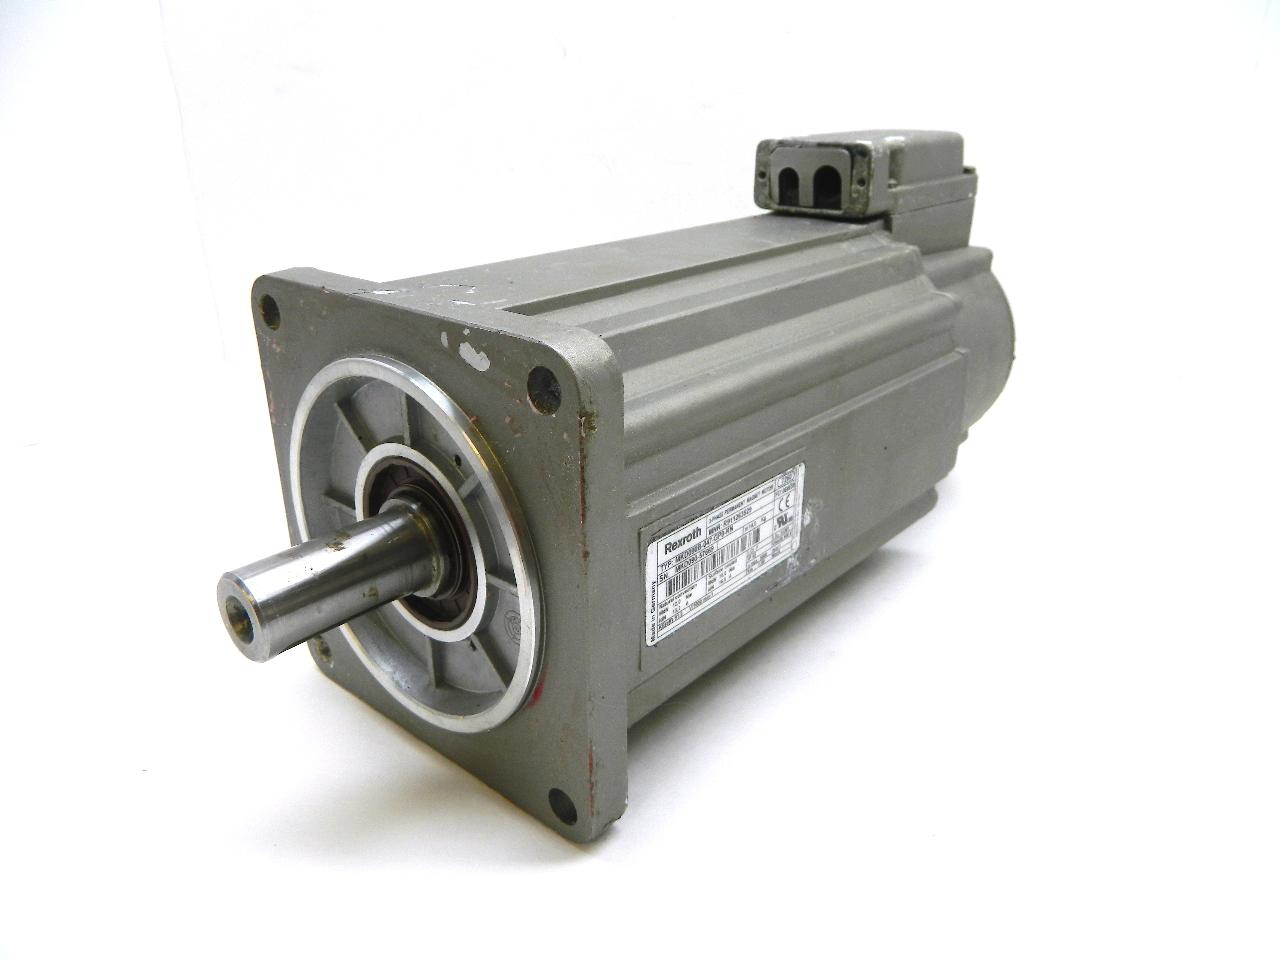 Rexroth Mkd090b 047 Gp0 Kn Servo Motor 600v Ac 3 Phase Mkd